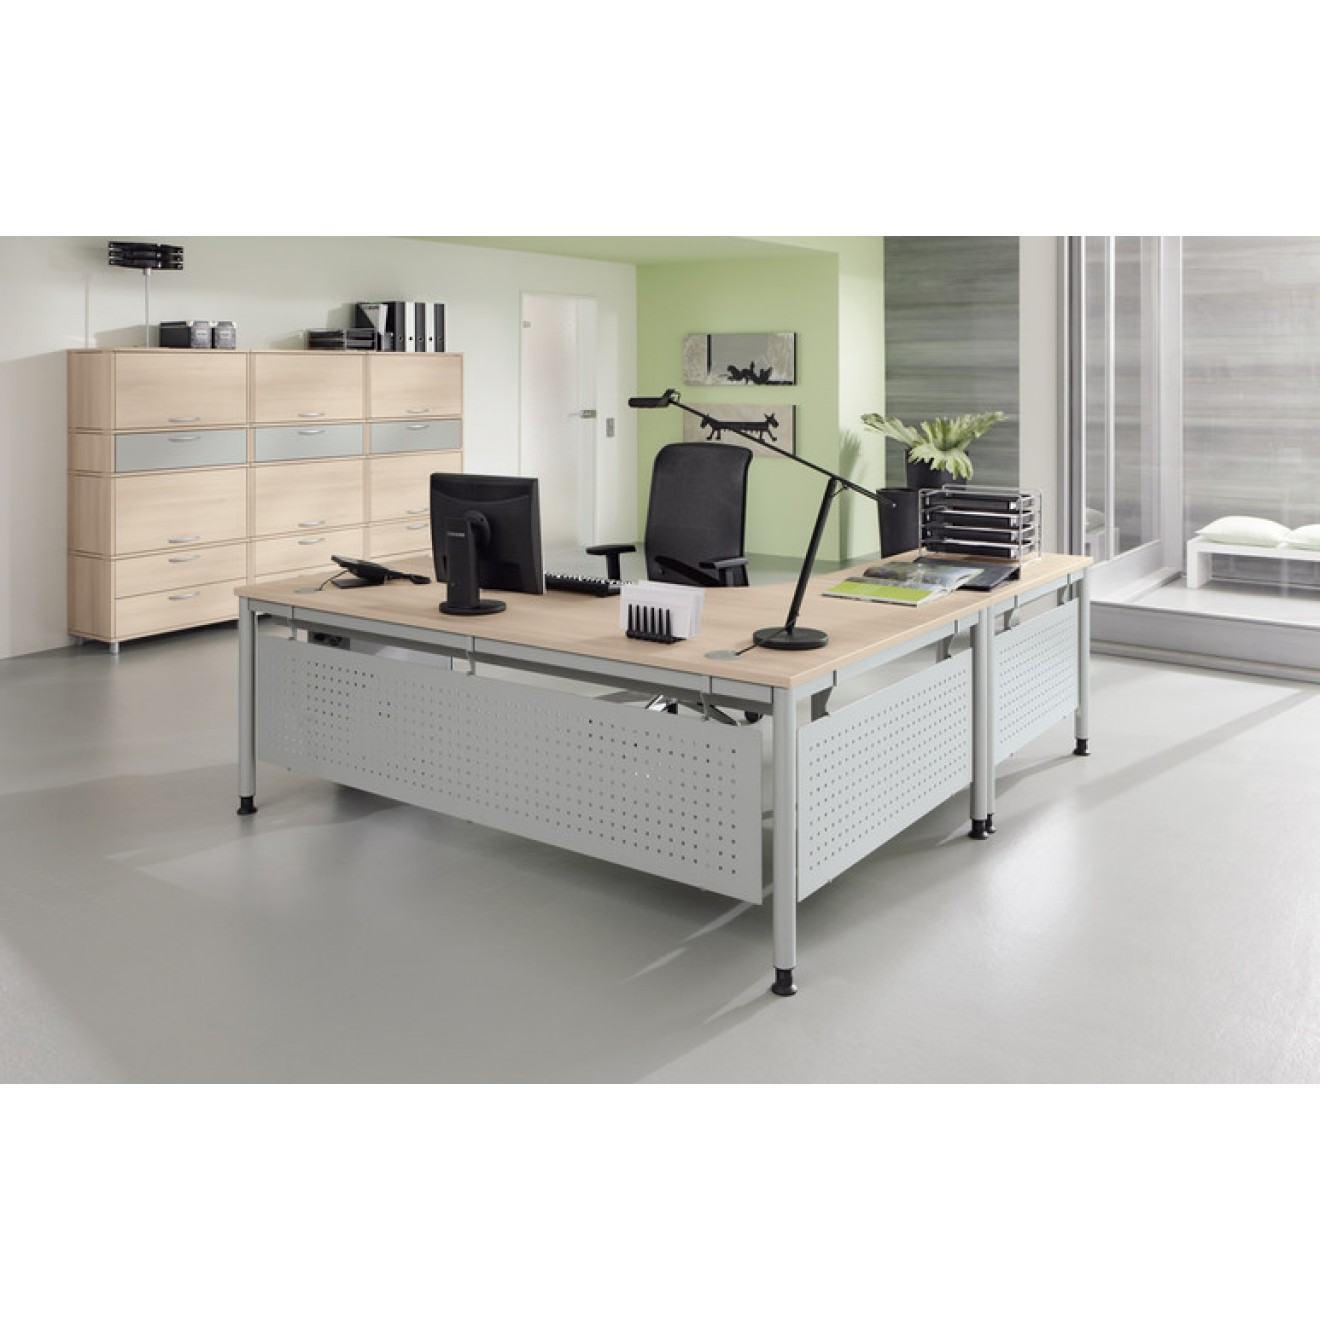 palmberg schreibtisch sinac tiefe 80 cm 80 200 cm. Black Bedroom Furniture Sets. Home Design Ideas